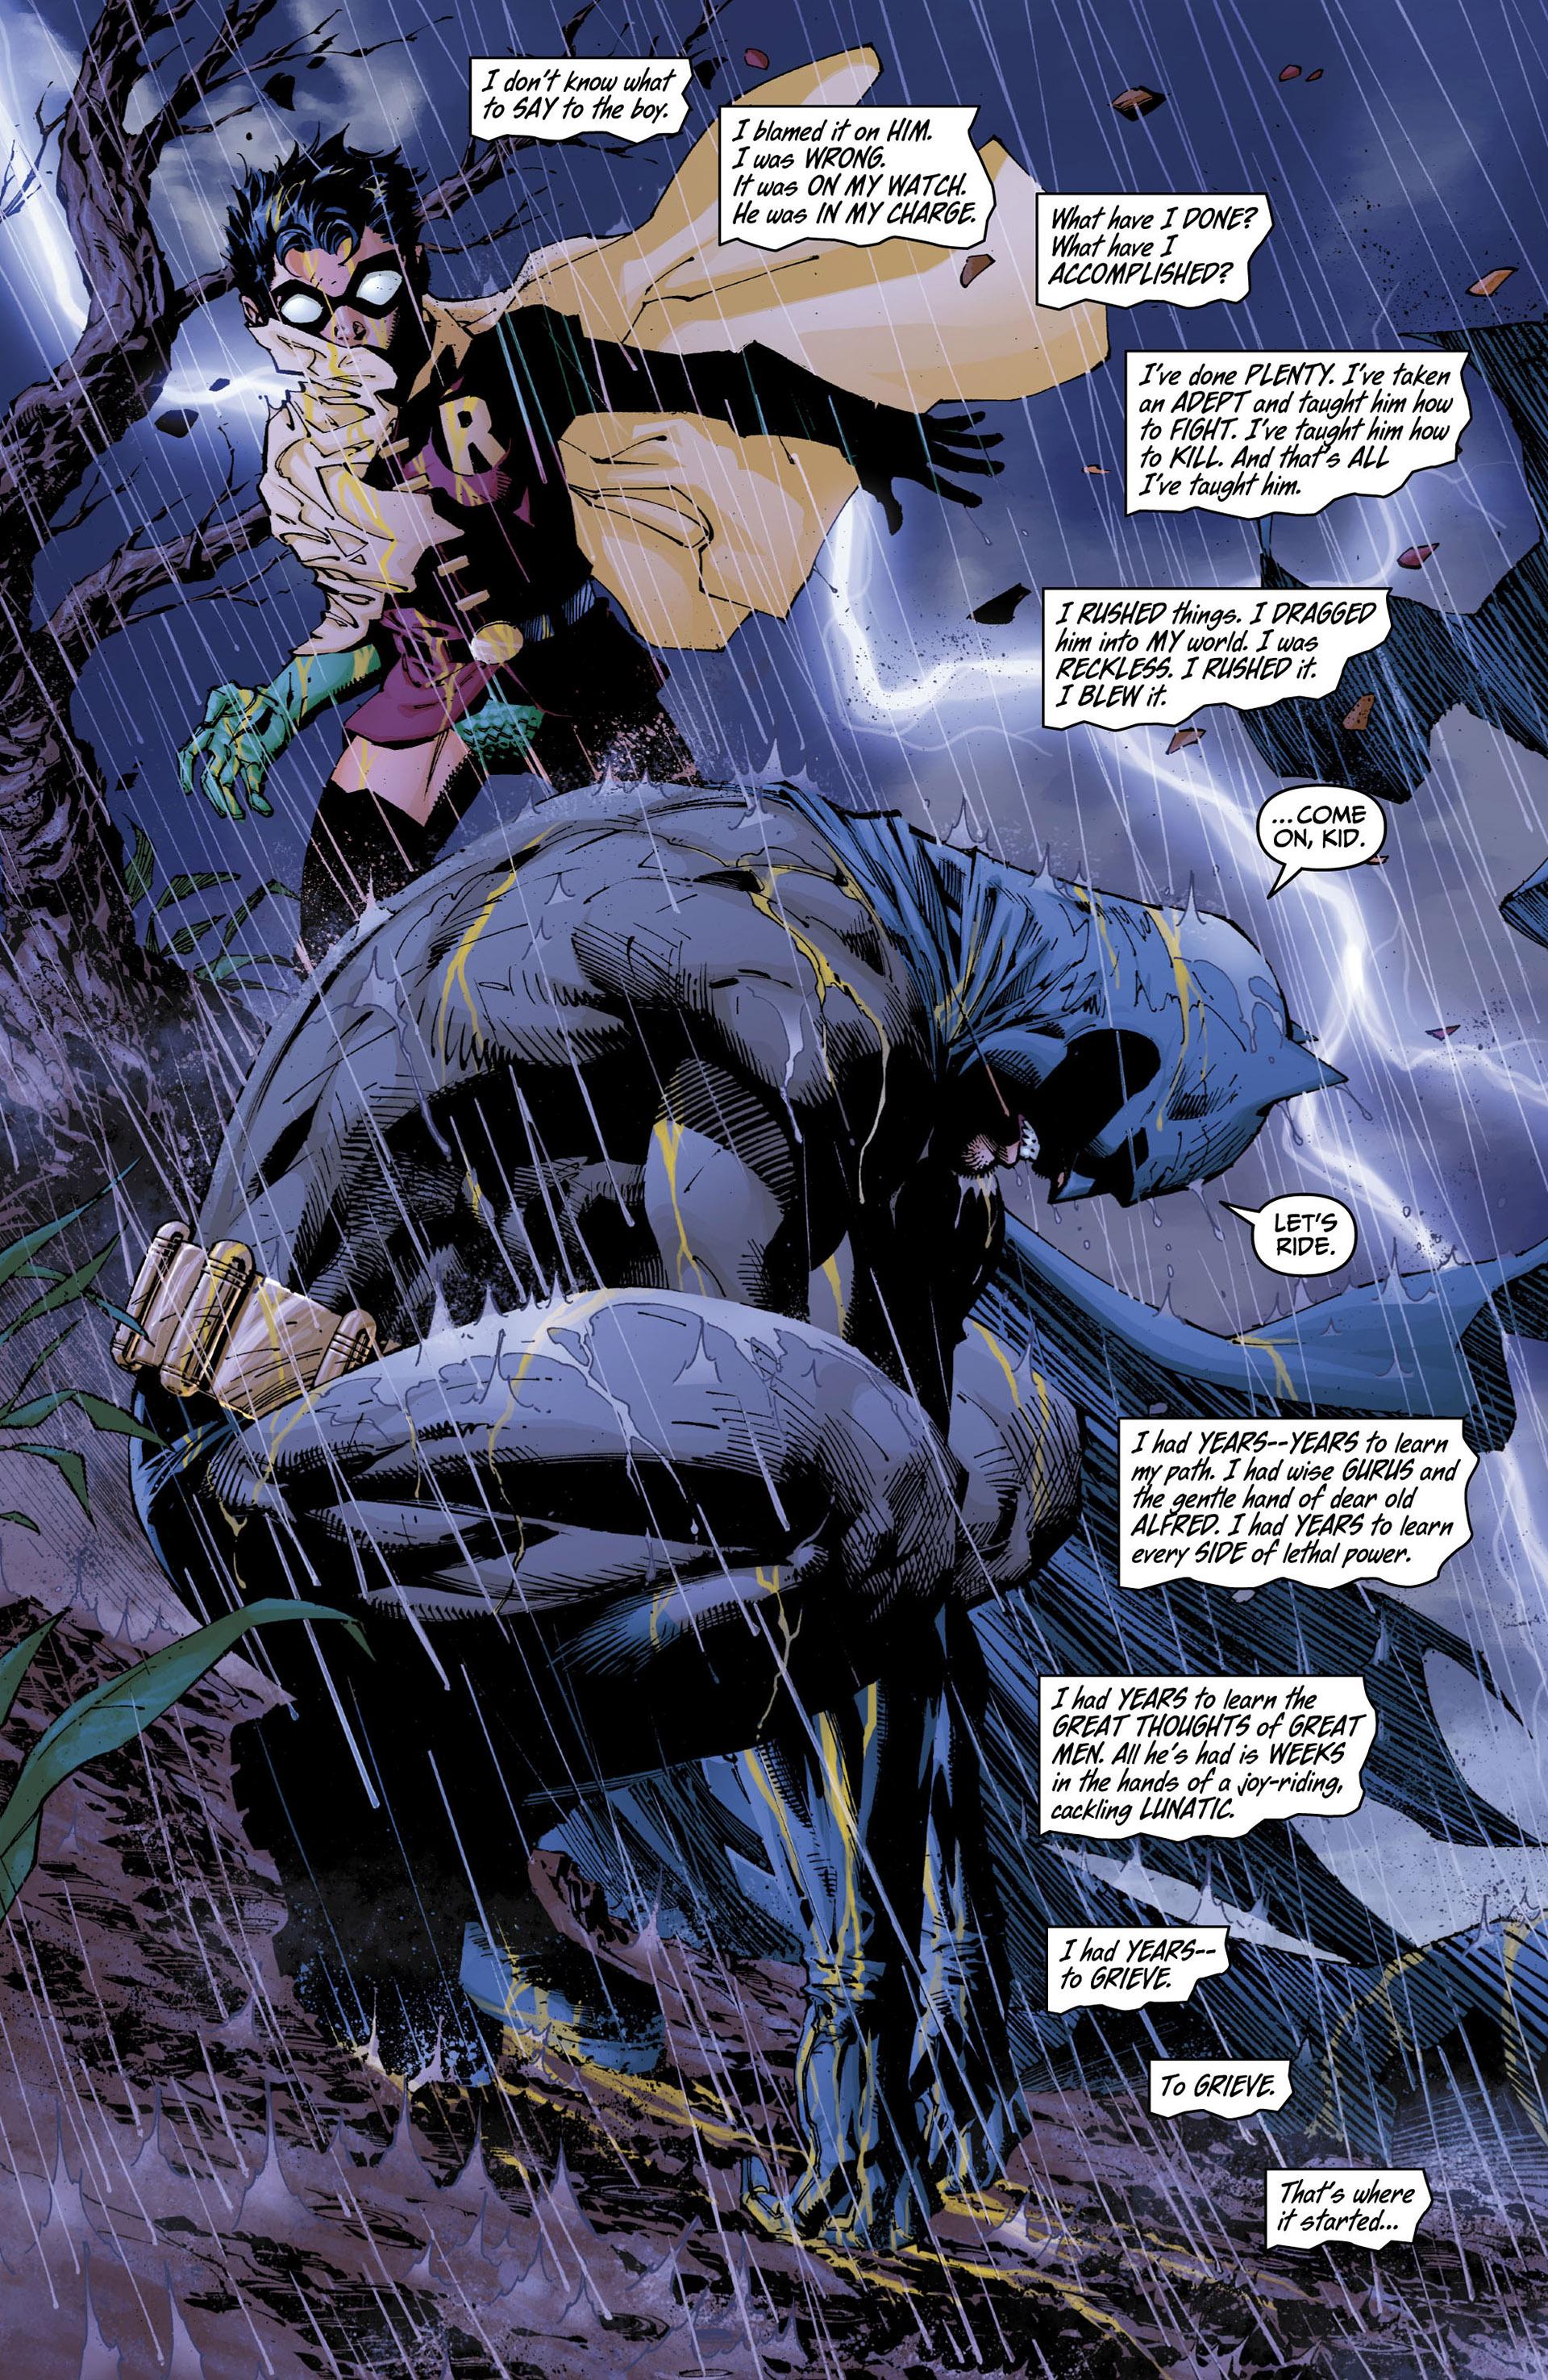 Read online All Star Batman & Robin, The Boy Wonder comic -  Issue #9 - 18